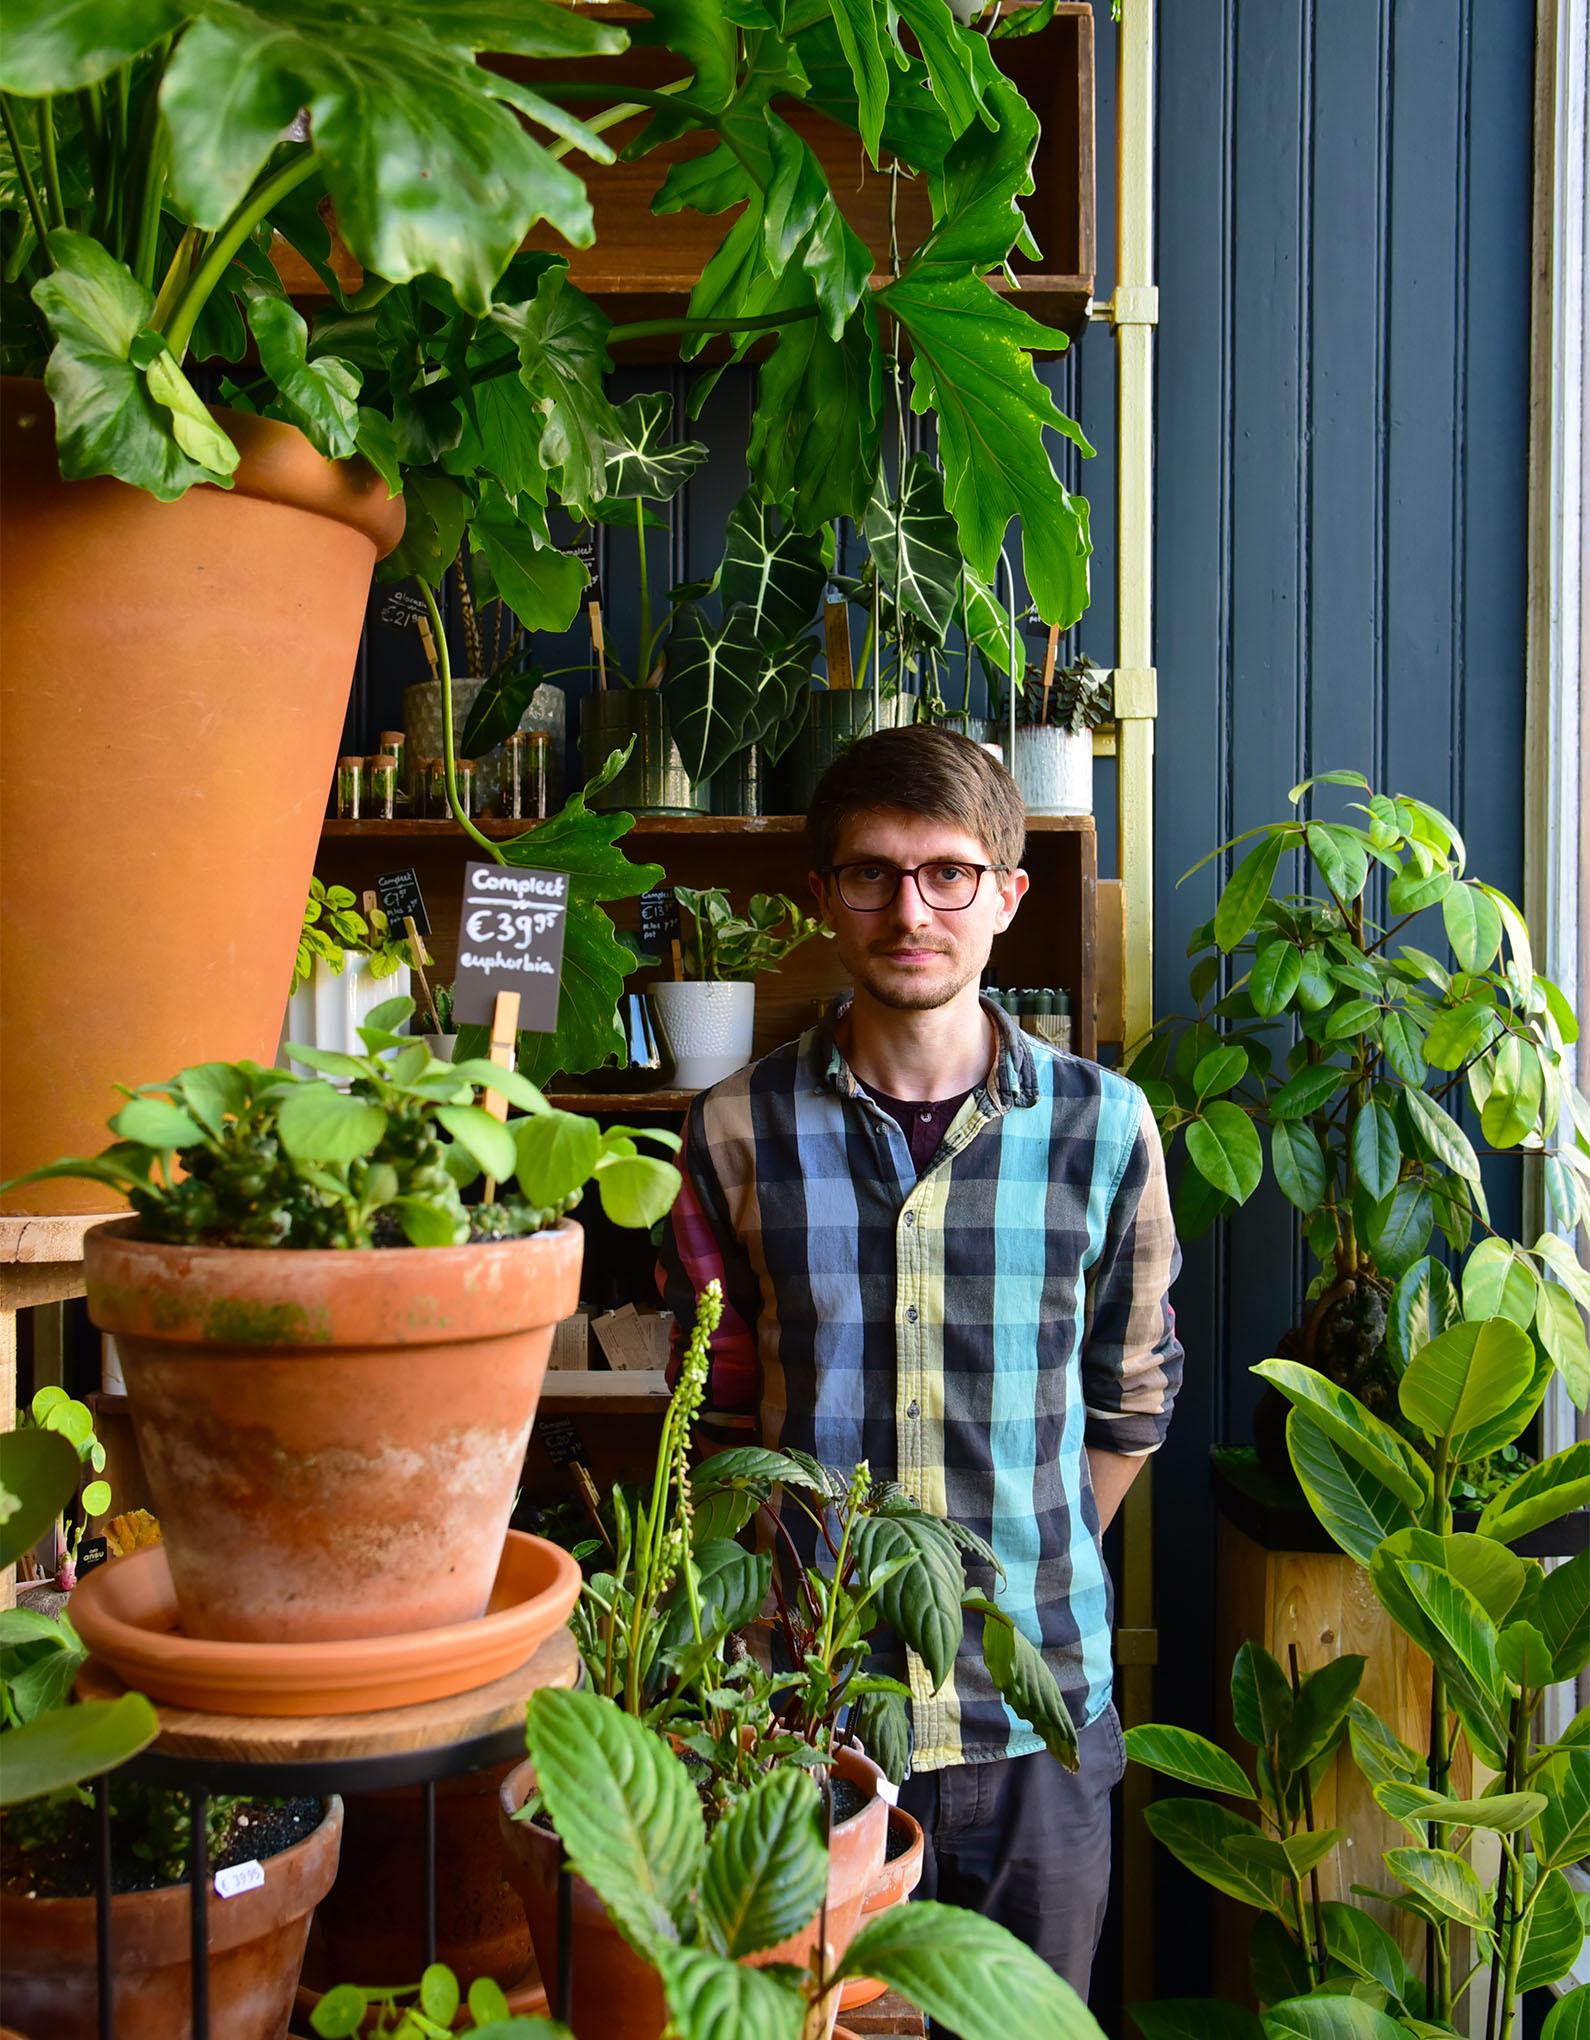 The Dutch florist Dennis Lanzaat at his shop in Amsterdam